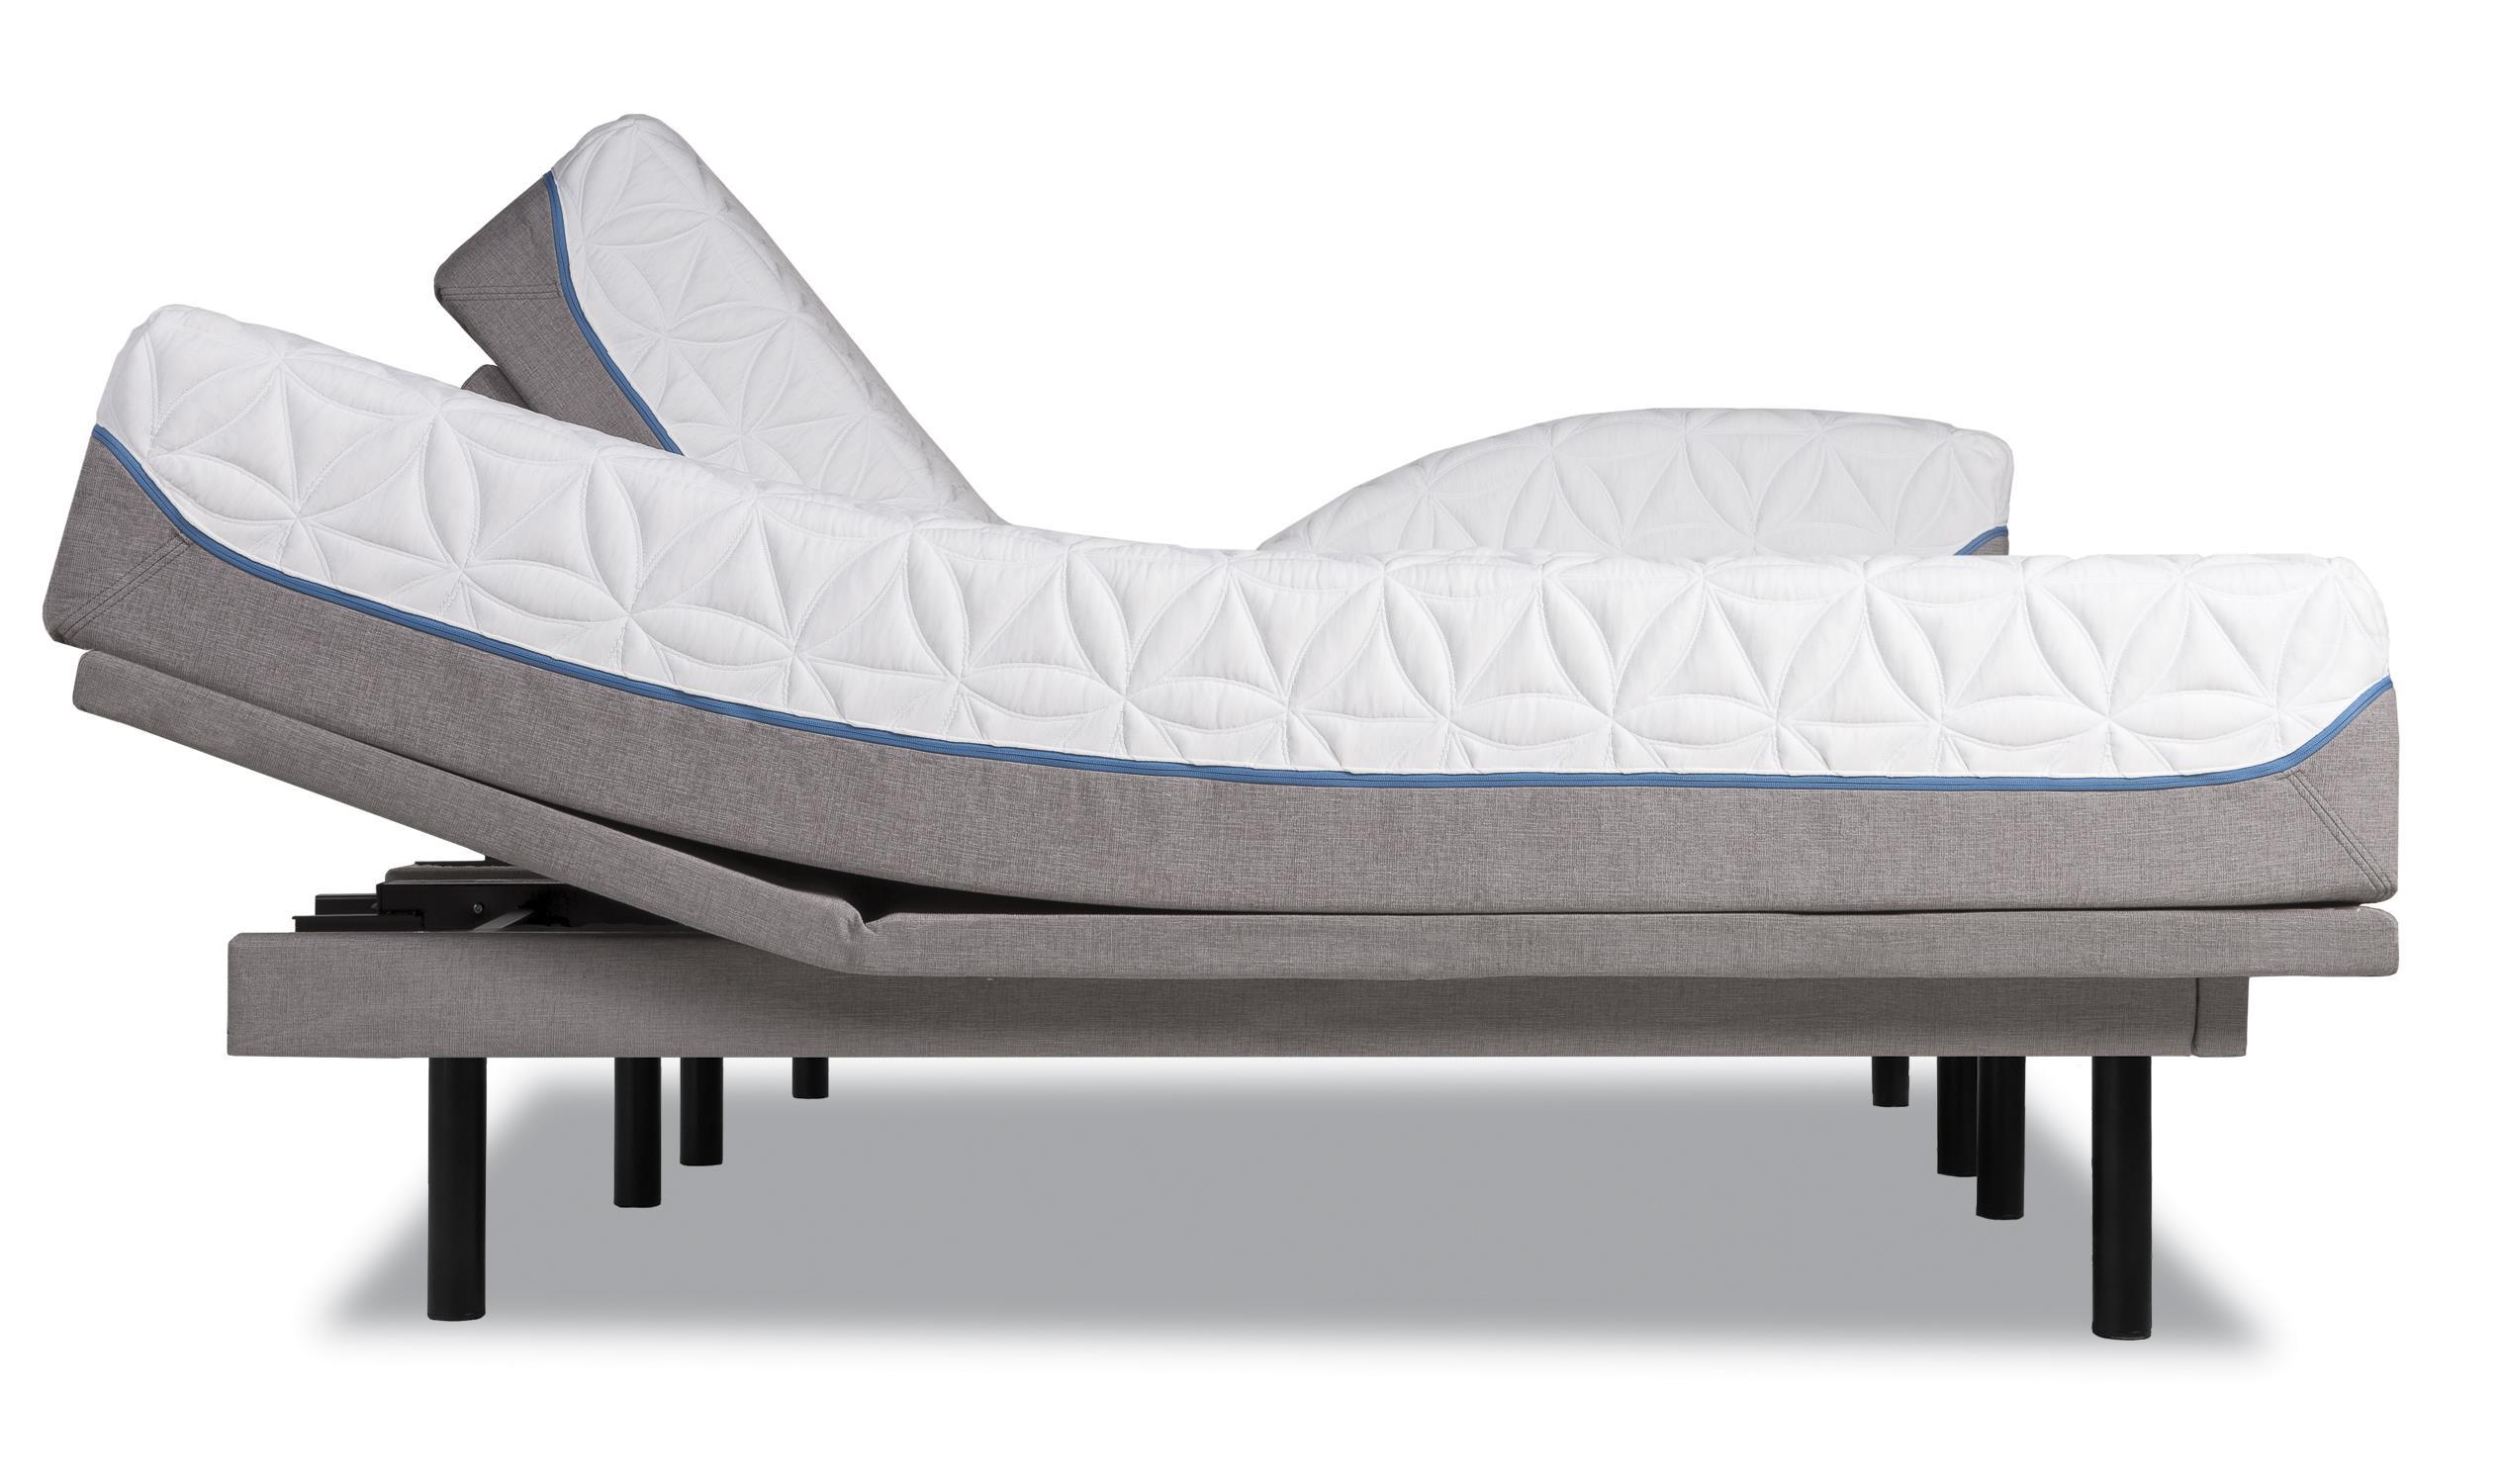 Tempur-Pedic® TEMPUR-Cloud Elite Queen Extra-Soft Mattress Set - Item Number: 10236150+25289250